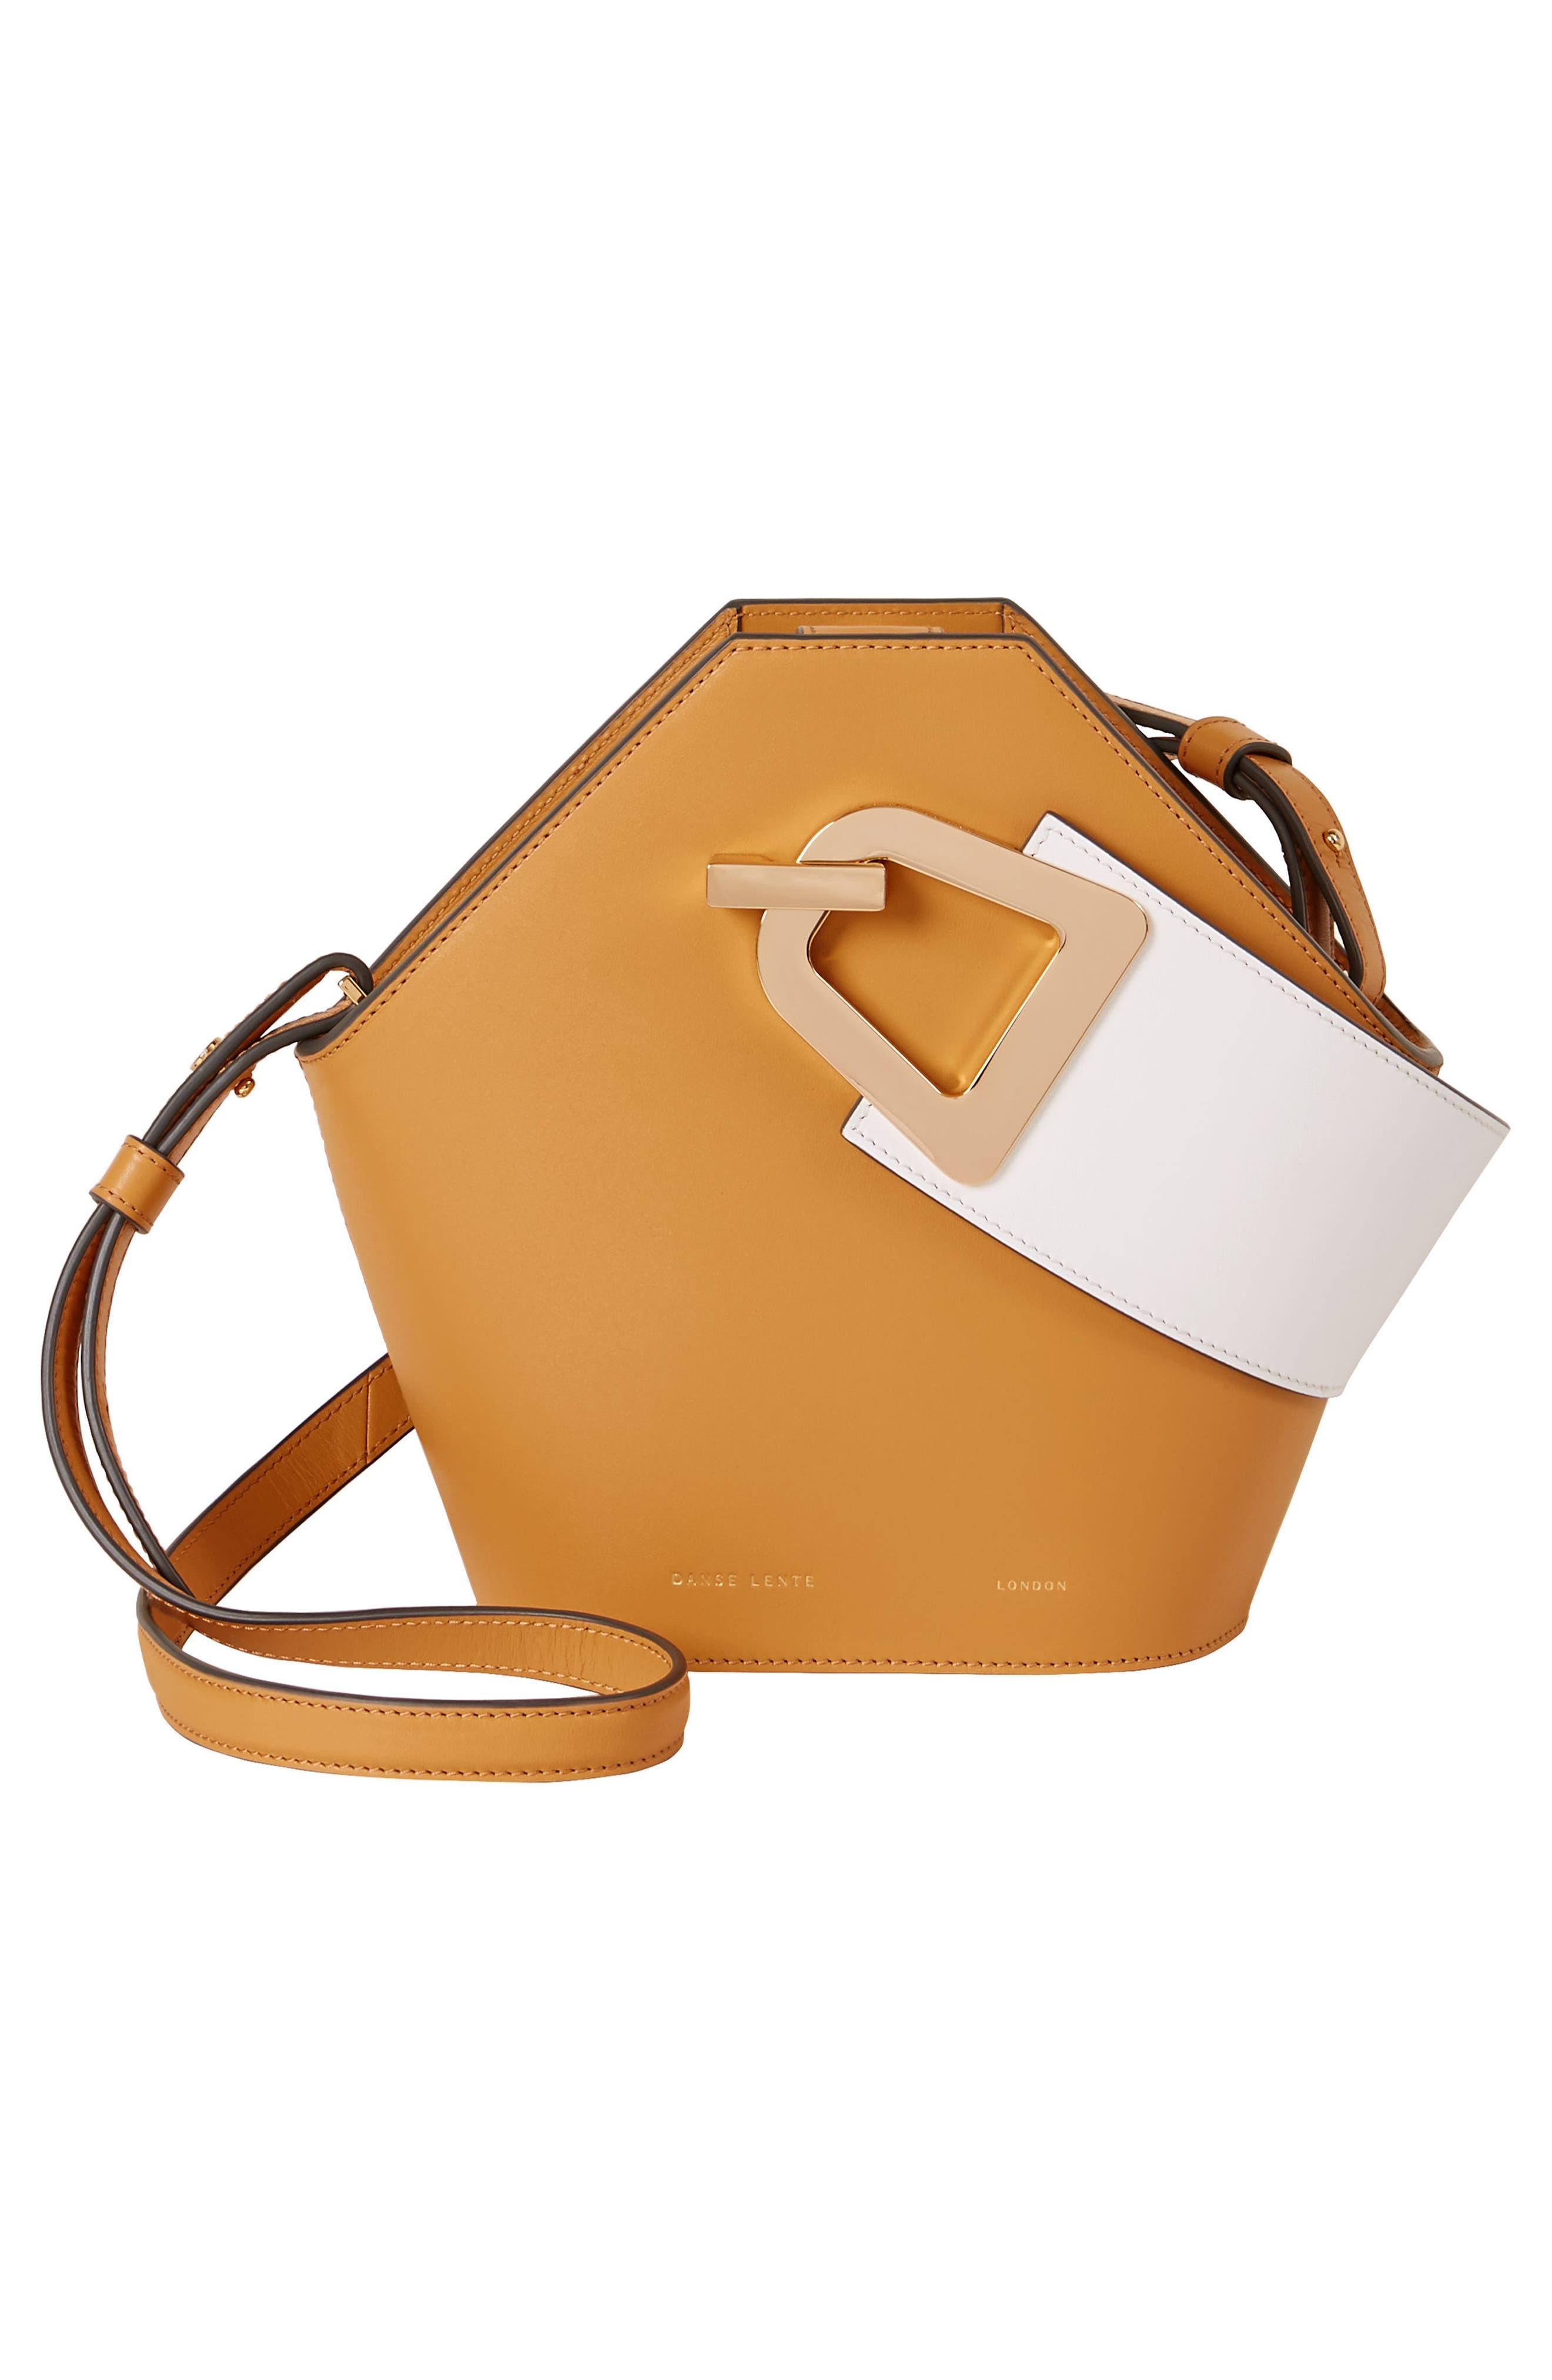 Mini Johnny Leather Bucket Bag,                             Alternate thumbnail 2, color,                             Sand